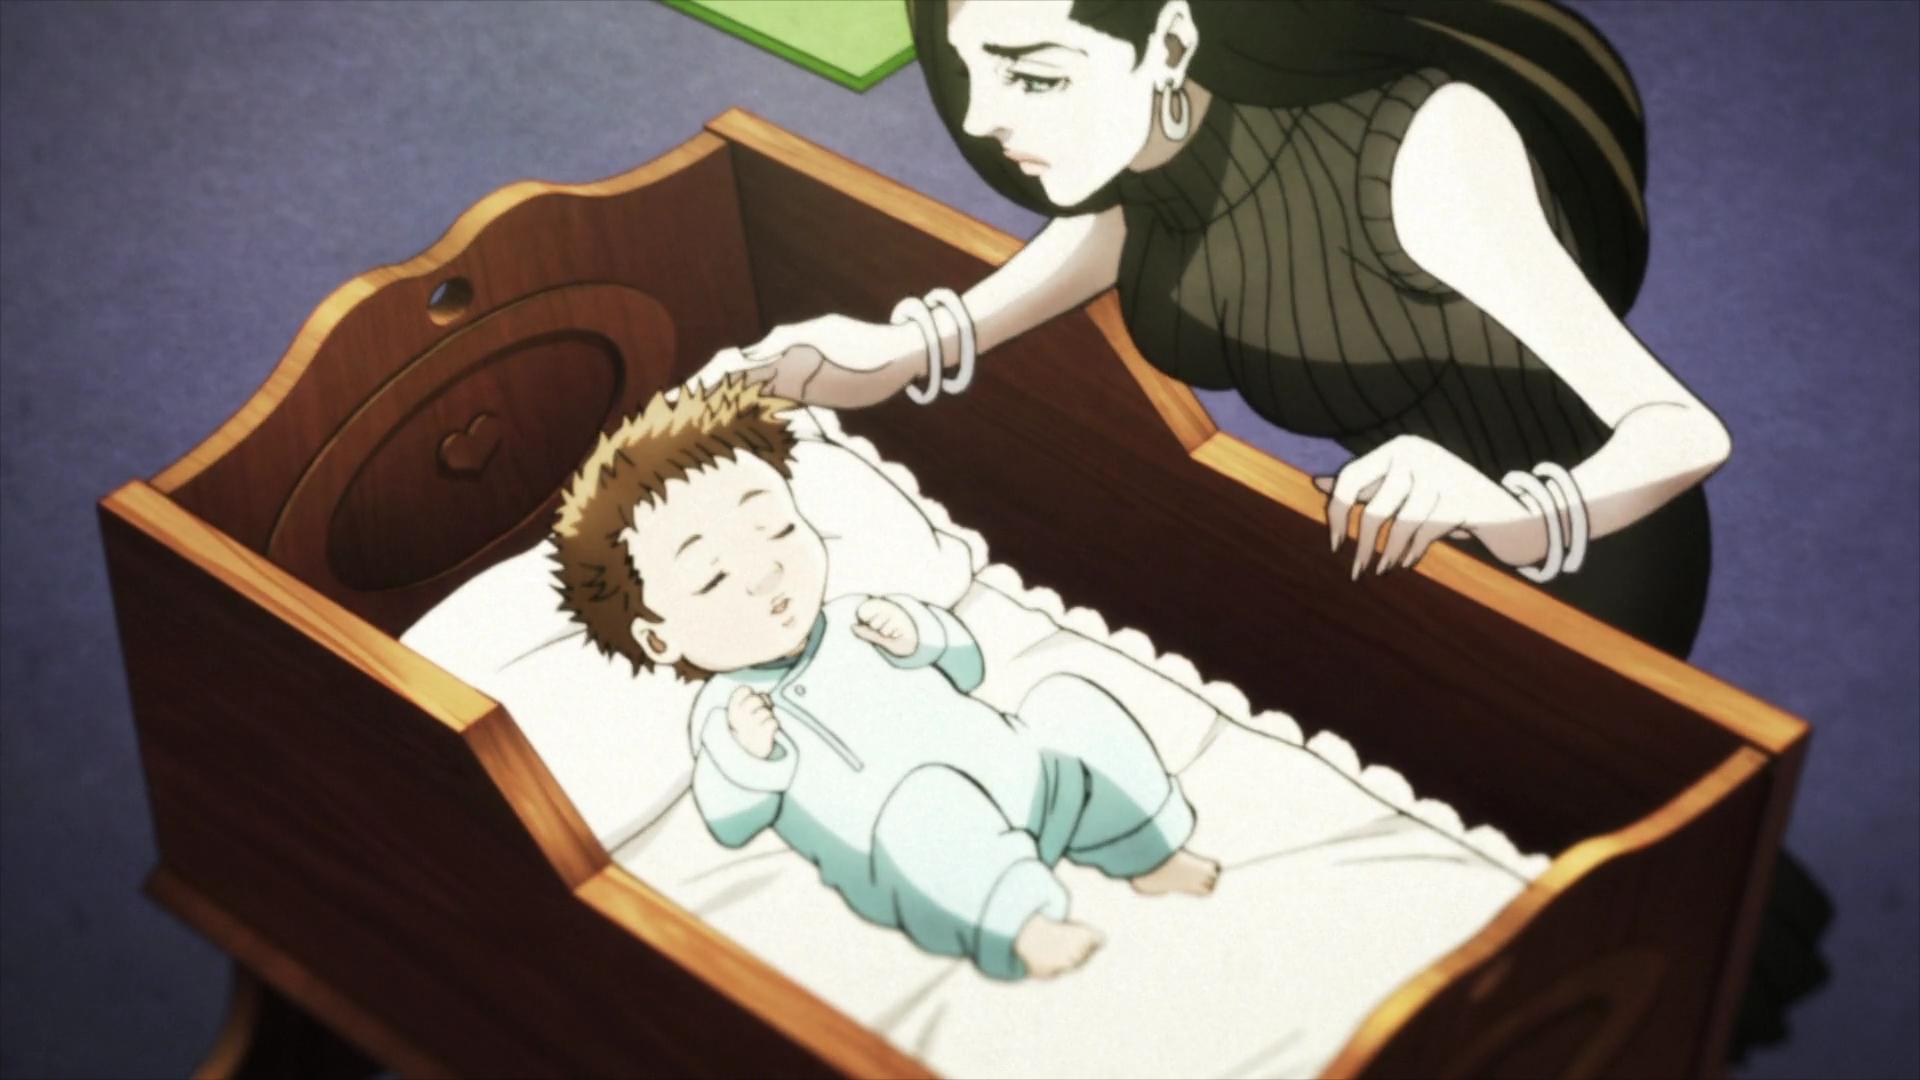 Elisabeth and son